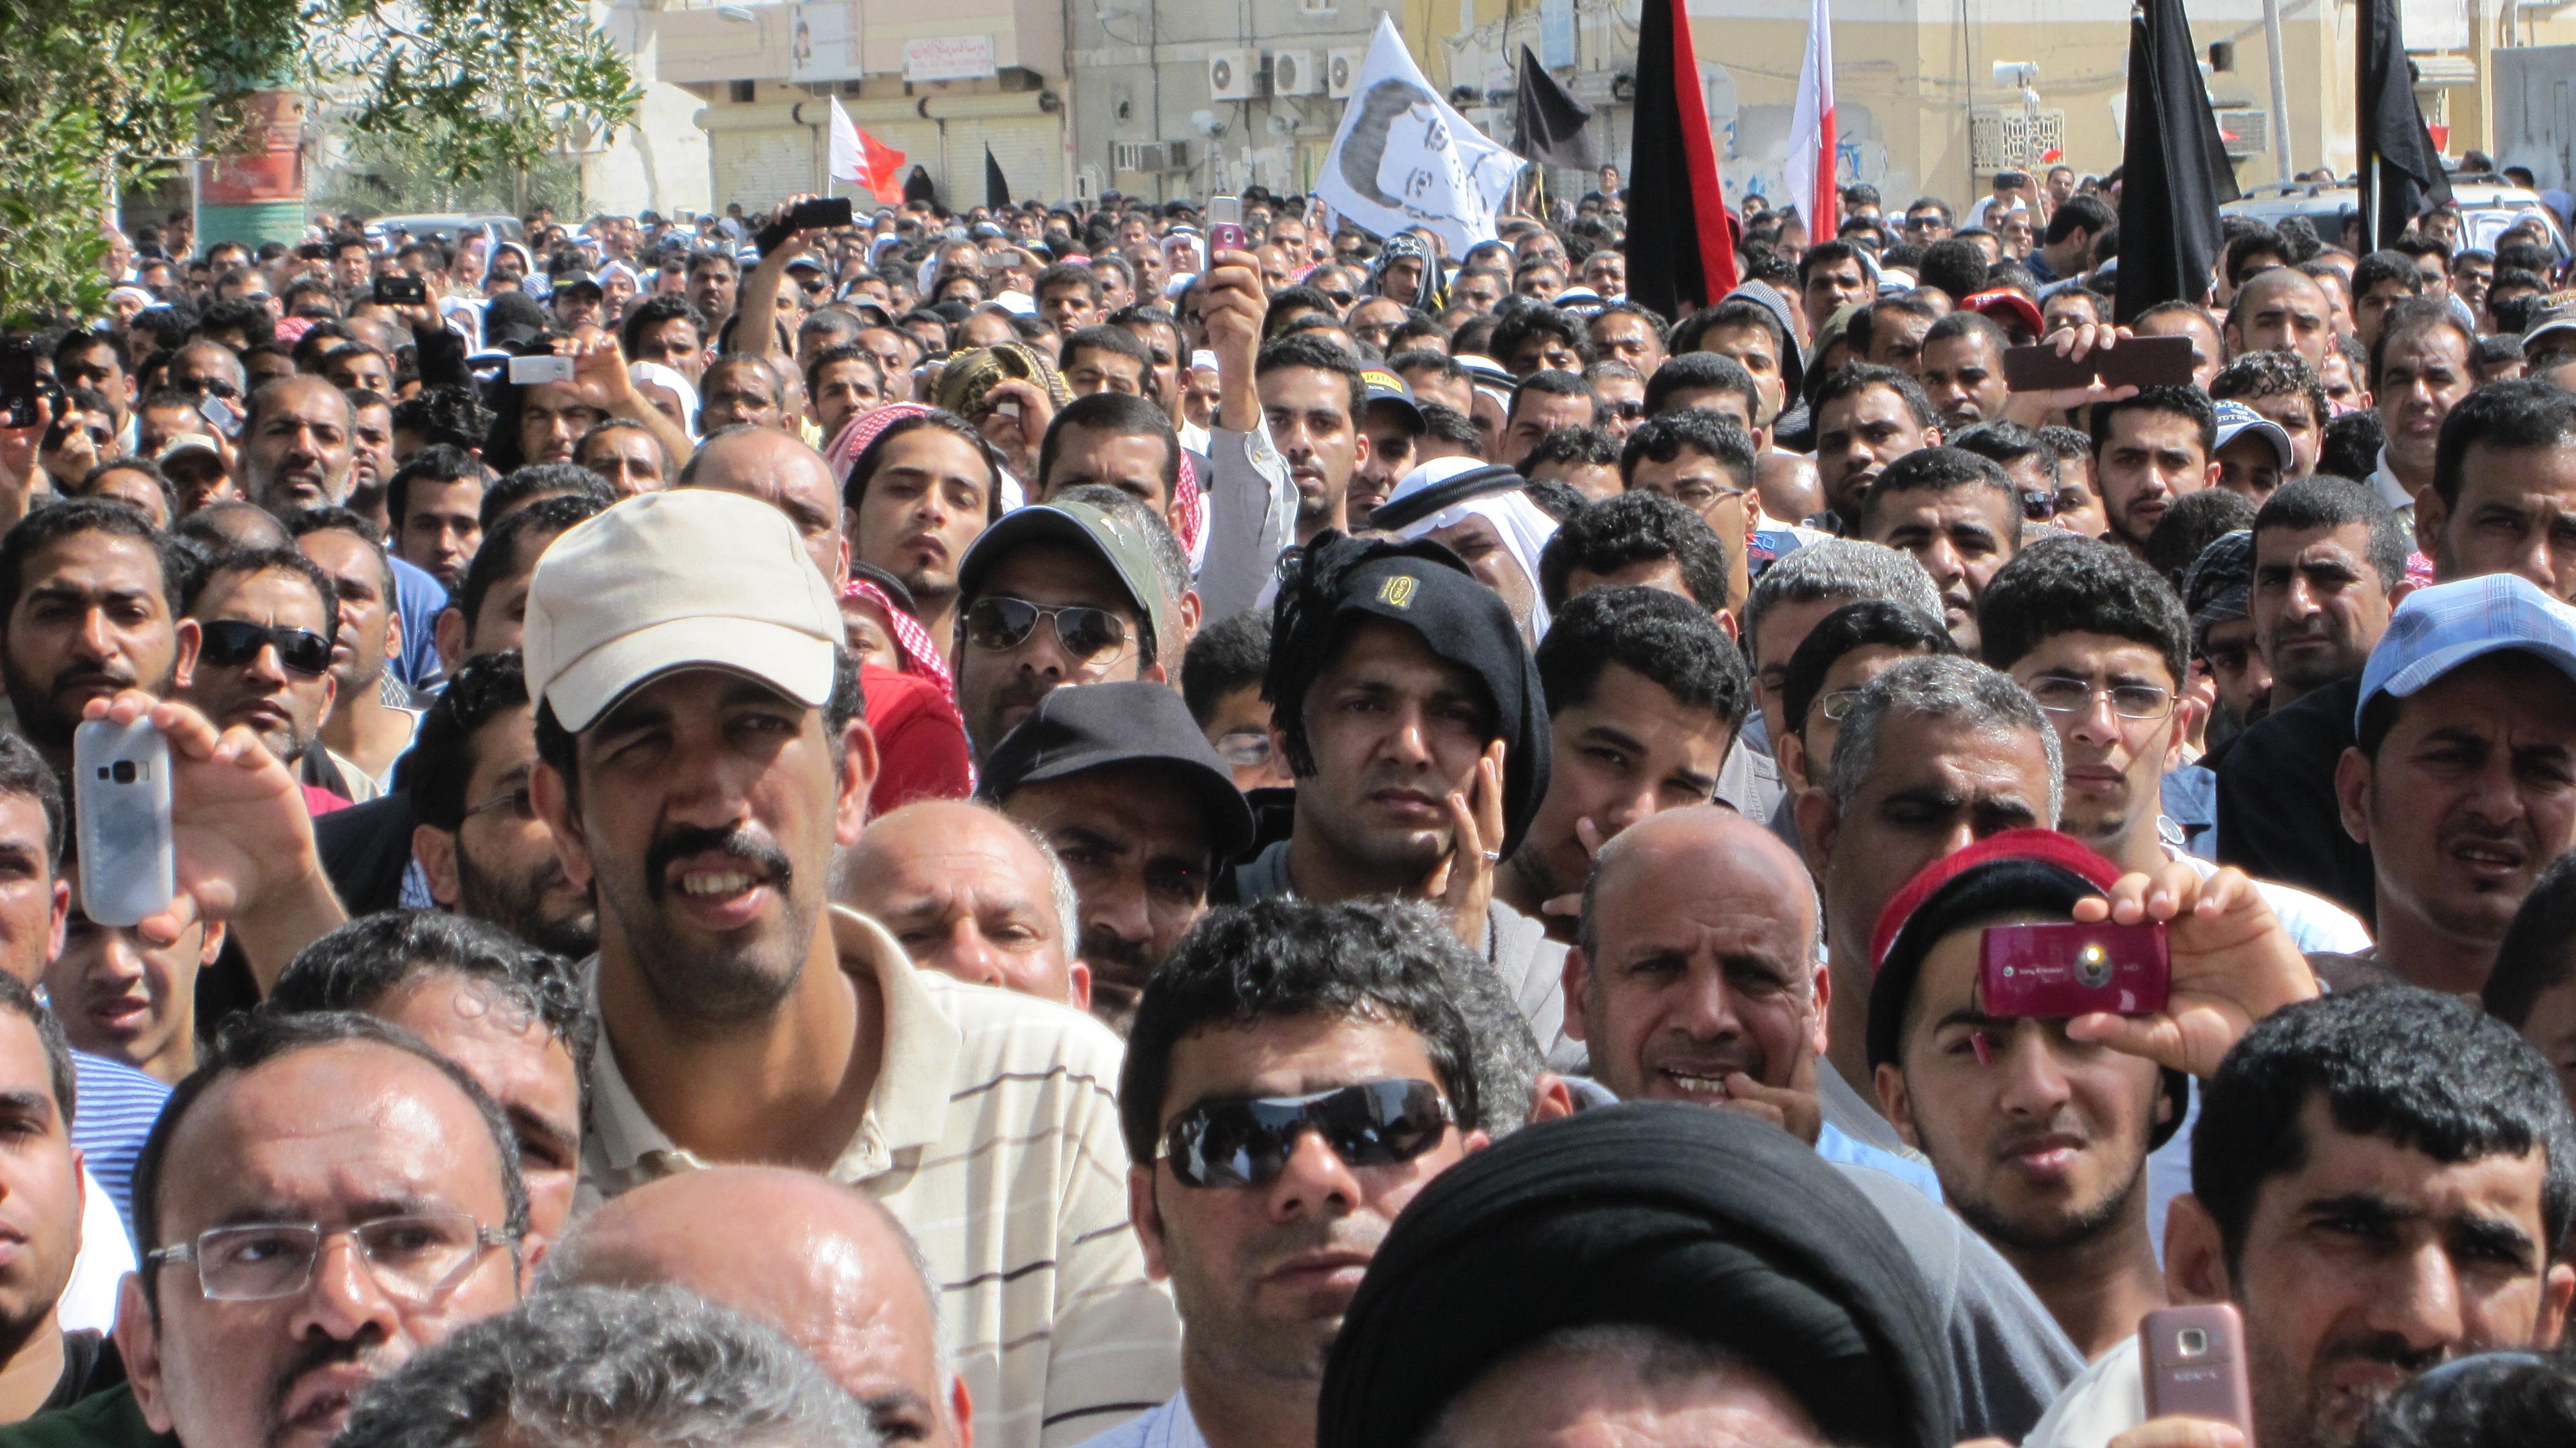 File:Crowd shot - Flickr - Al Jazeera English.jpg - Wikimedia Commons